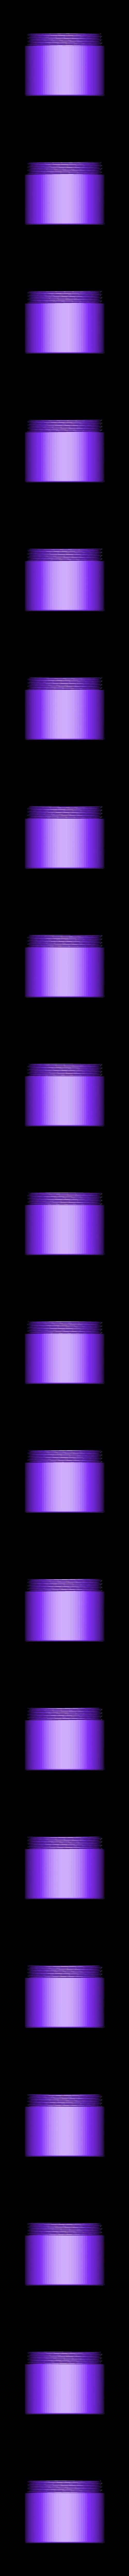 Muffin_Holder_Base.stl Télécharger fichier STL gratuit Support à muffins • Plan pour impression 3D, DraftingJake